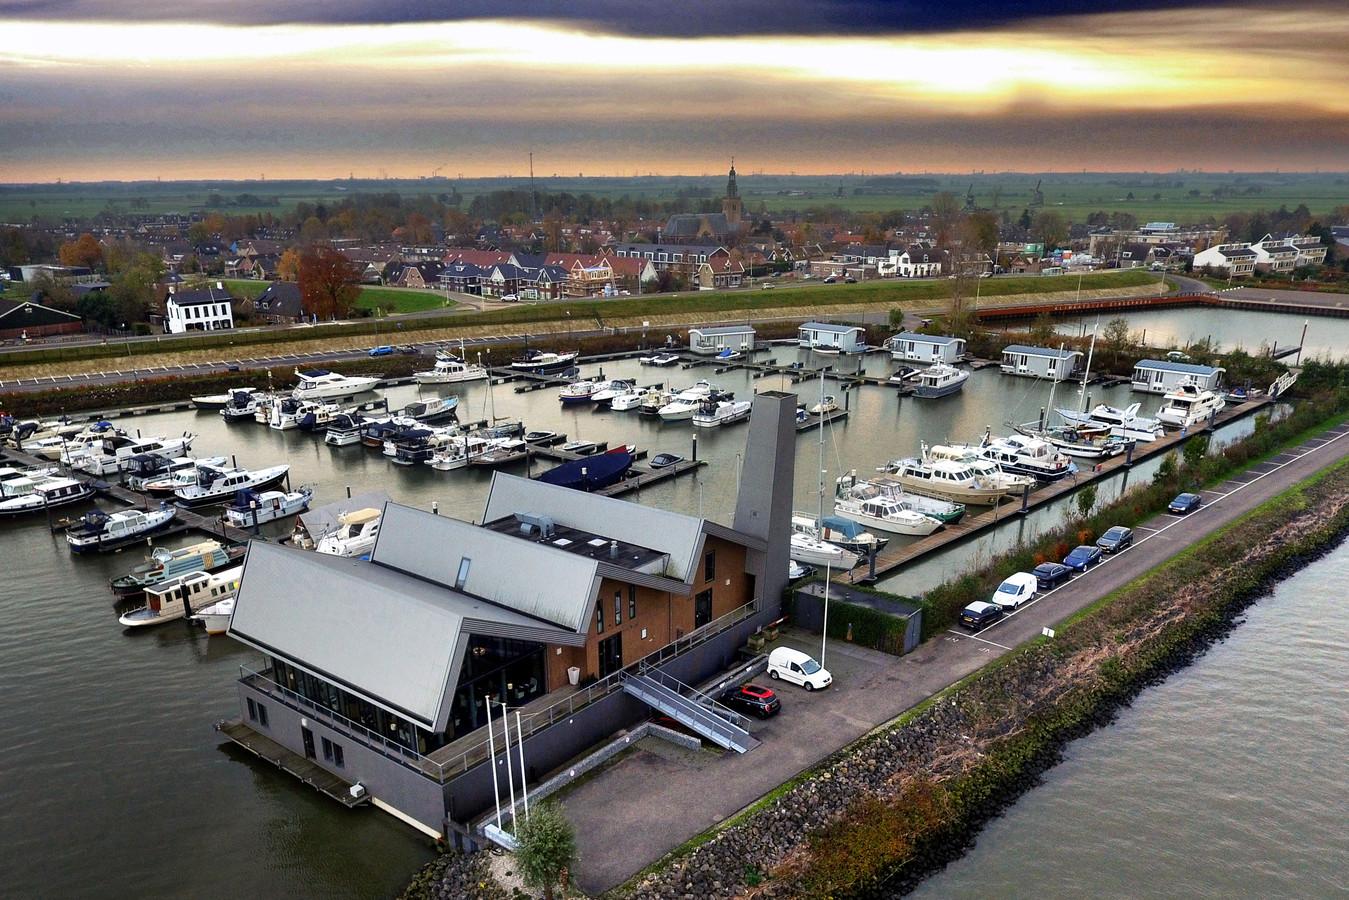 De Limonadefabriek in Streefkerk staat te koop.